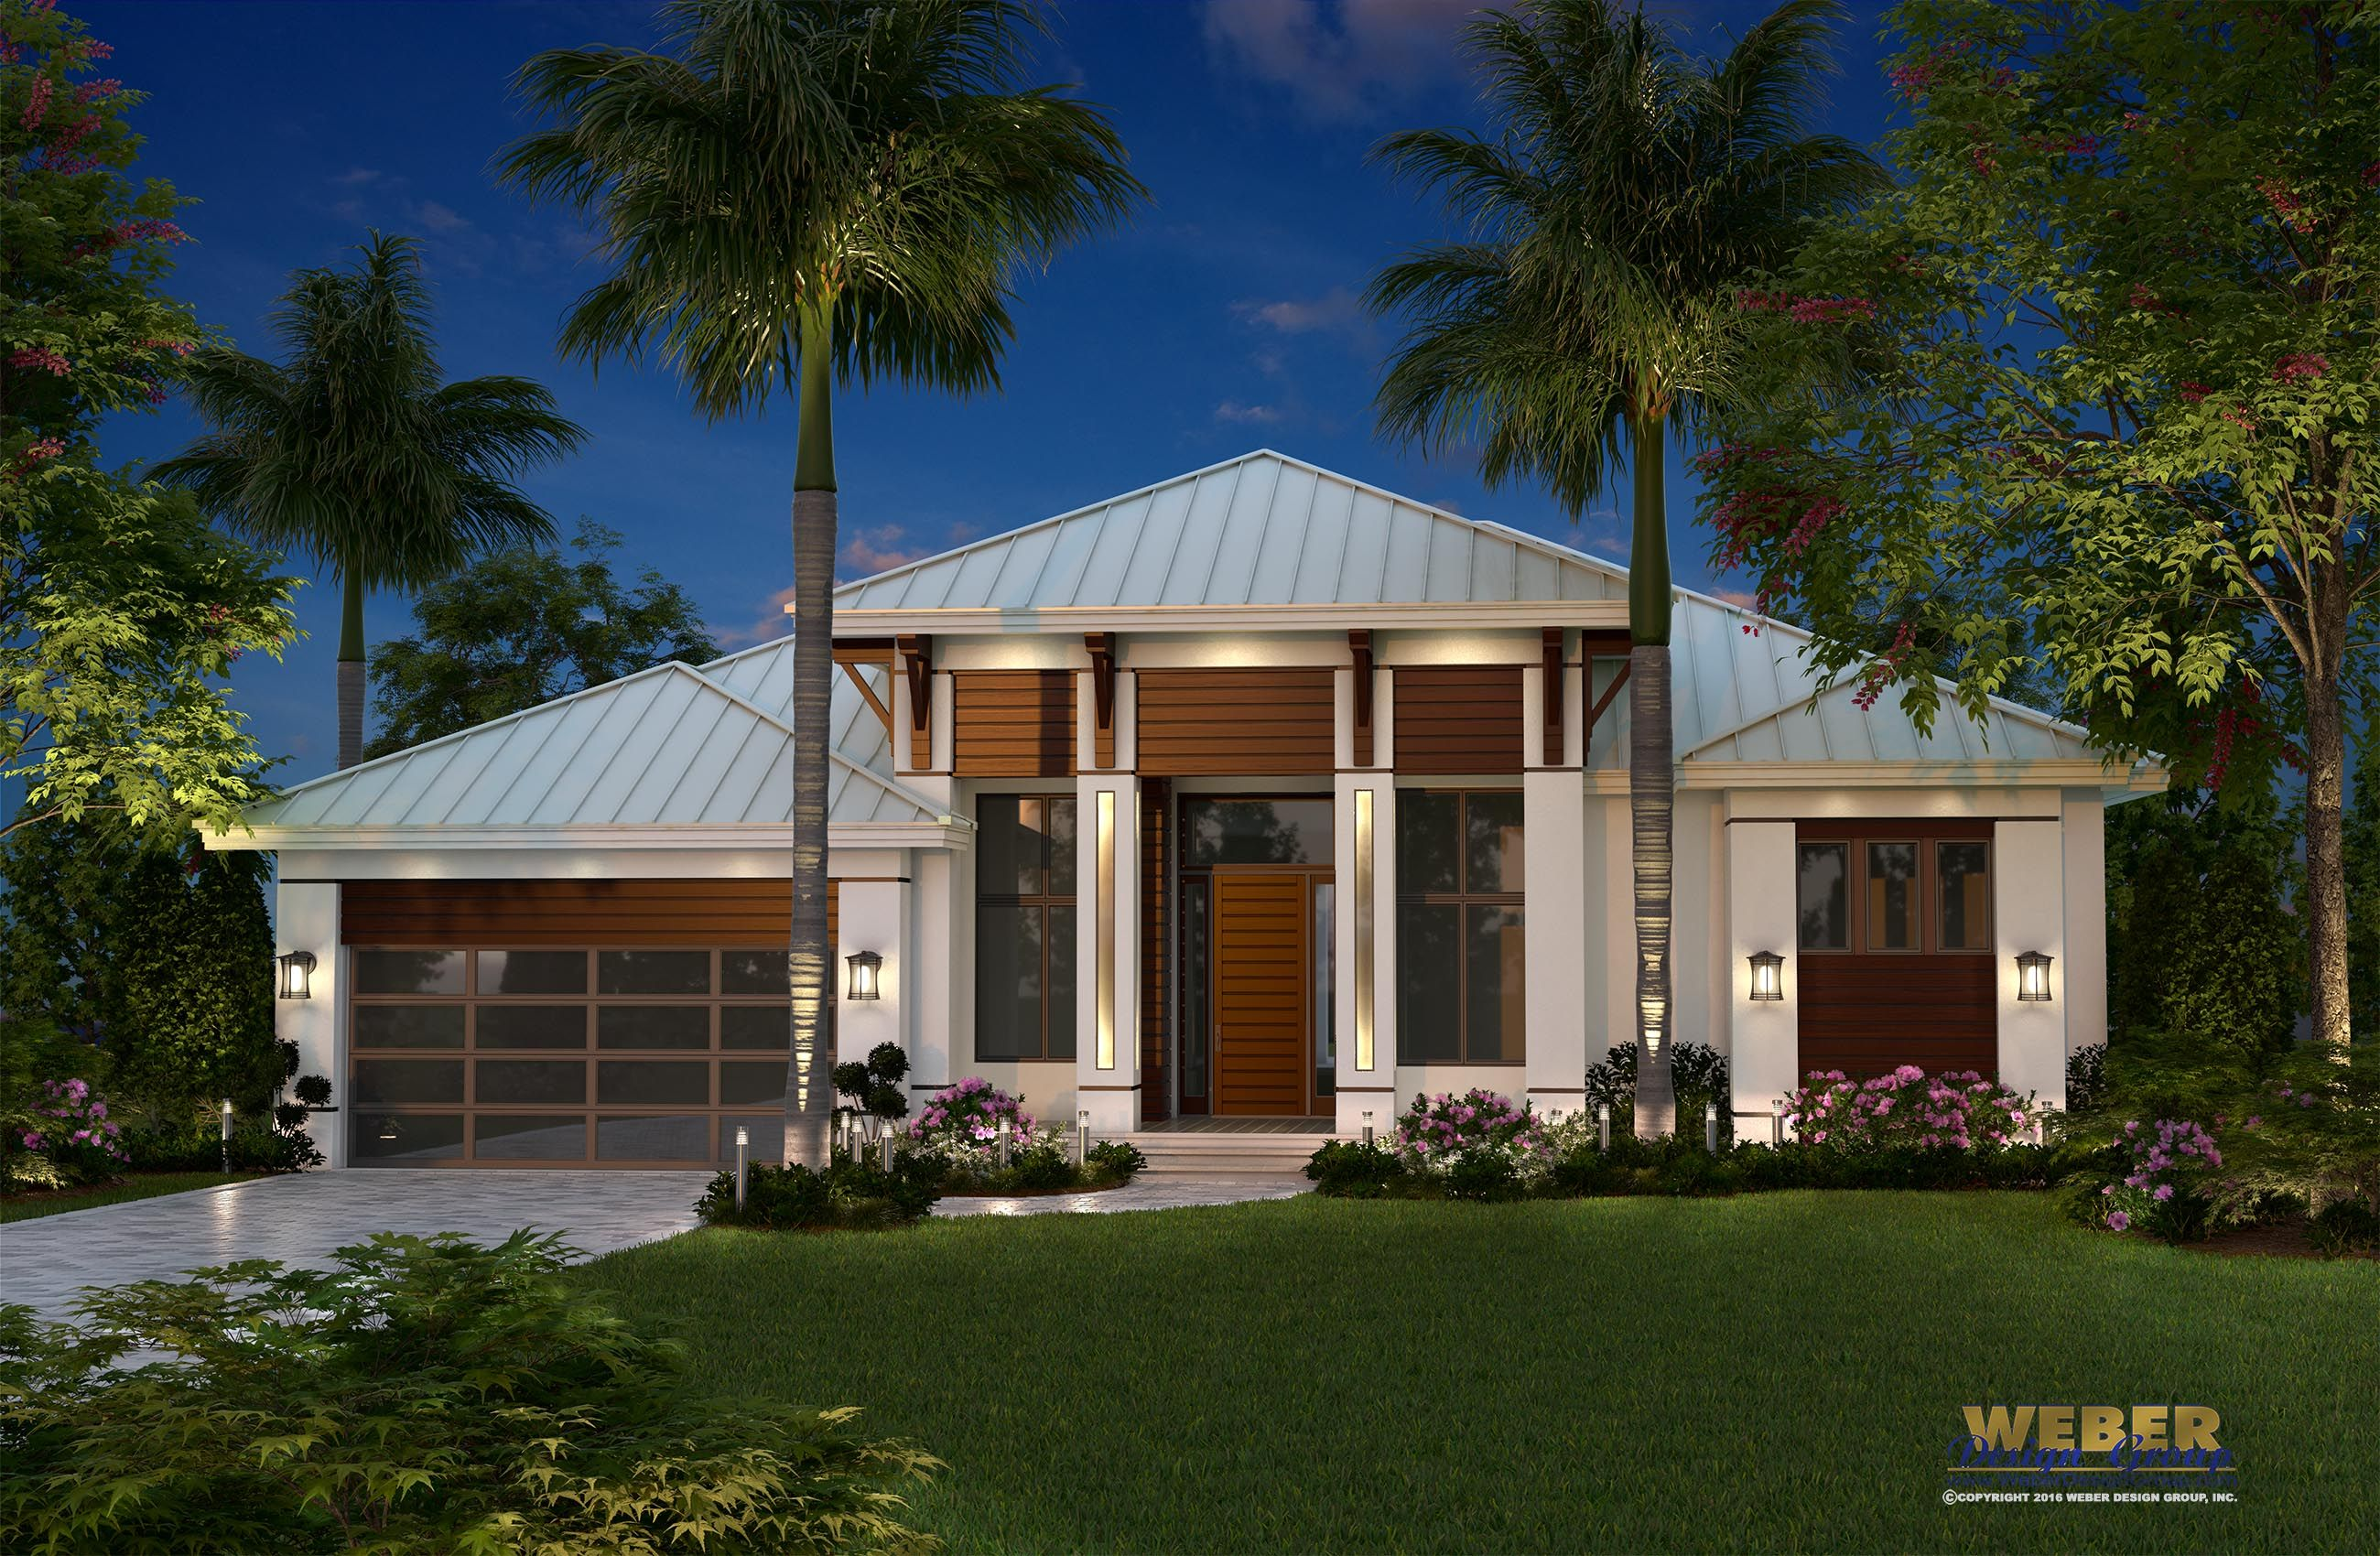 Best Kitchen Gallery: Beach House Plan Contemporary Caribbean Beach Home Floor Plan of Modern Single Story Coastal House on rachelxblog.com